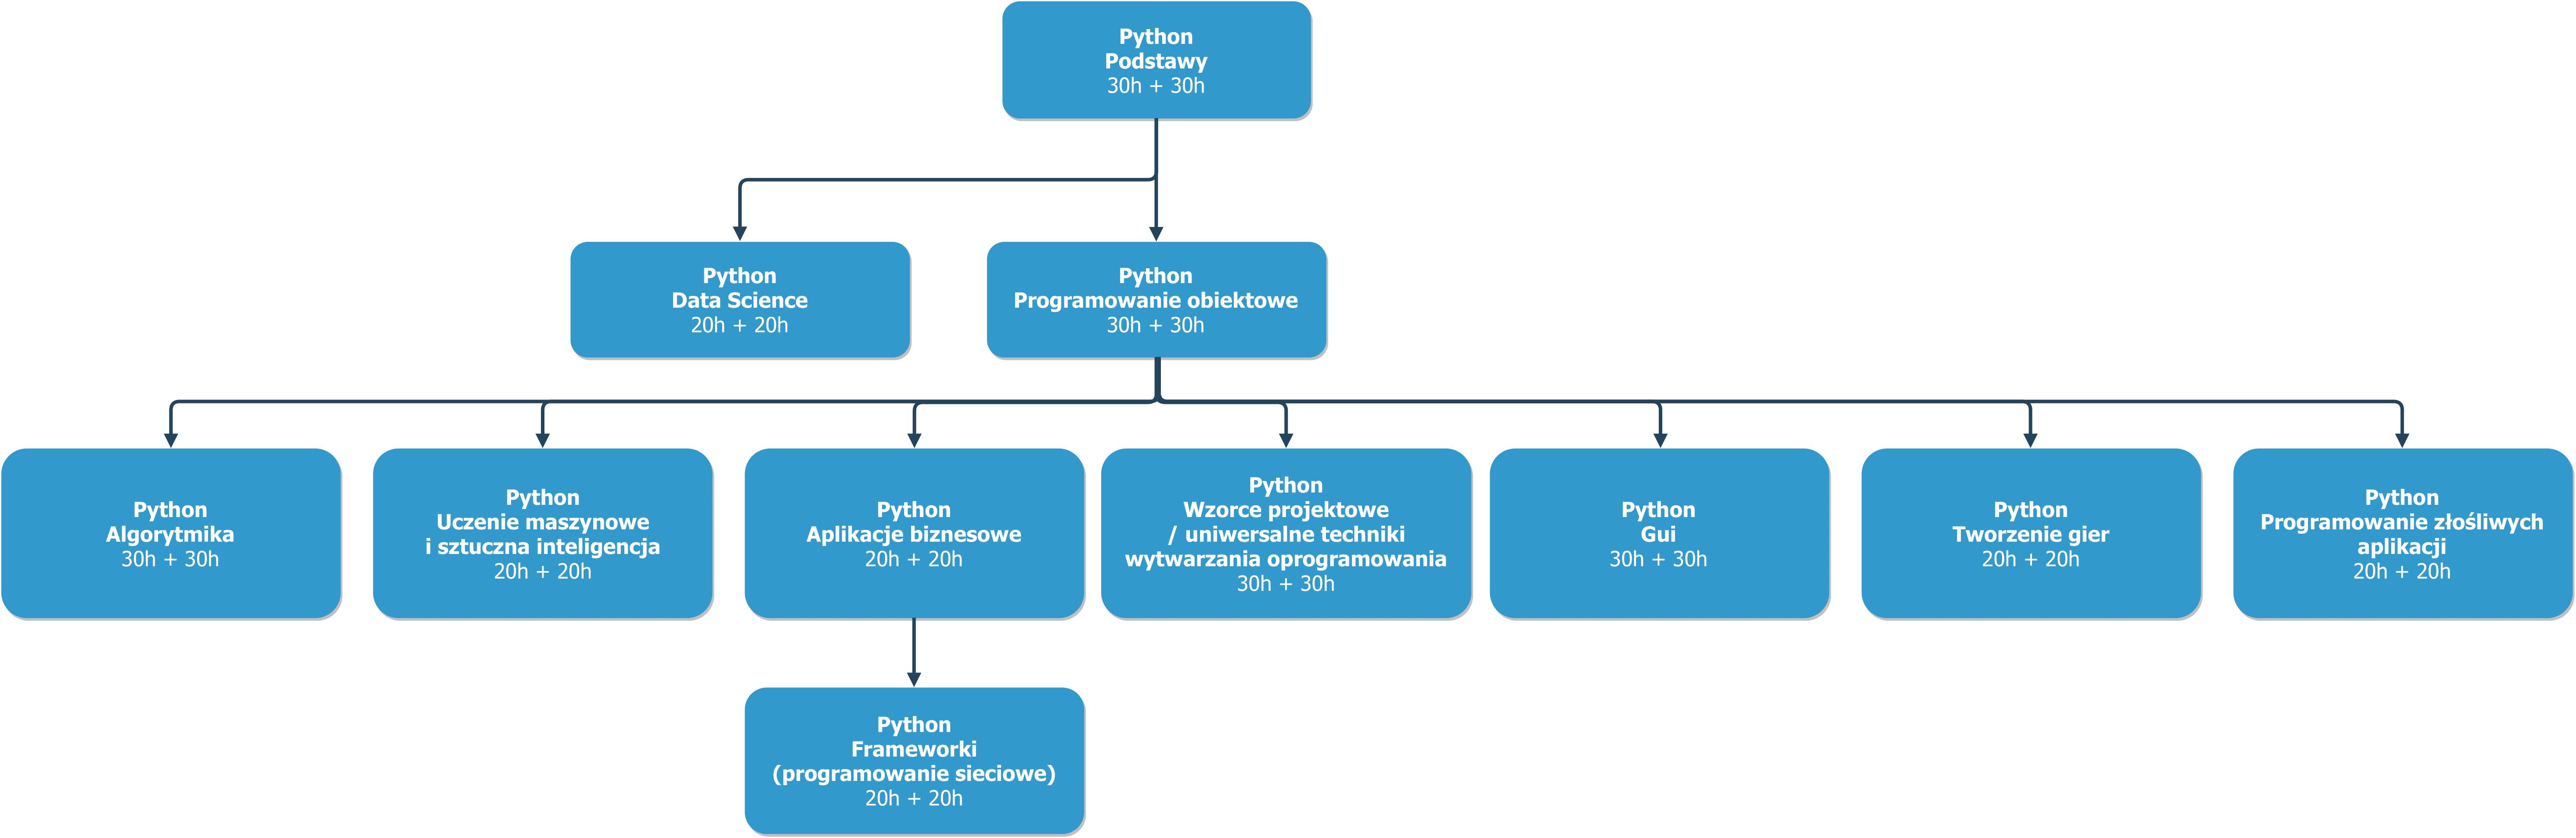 Python_poziom (1)